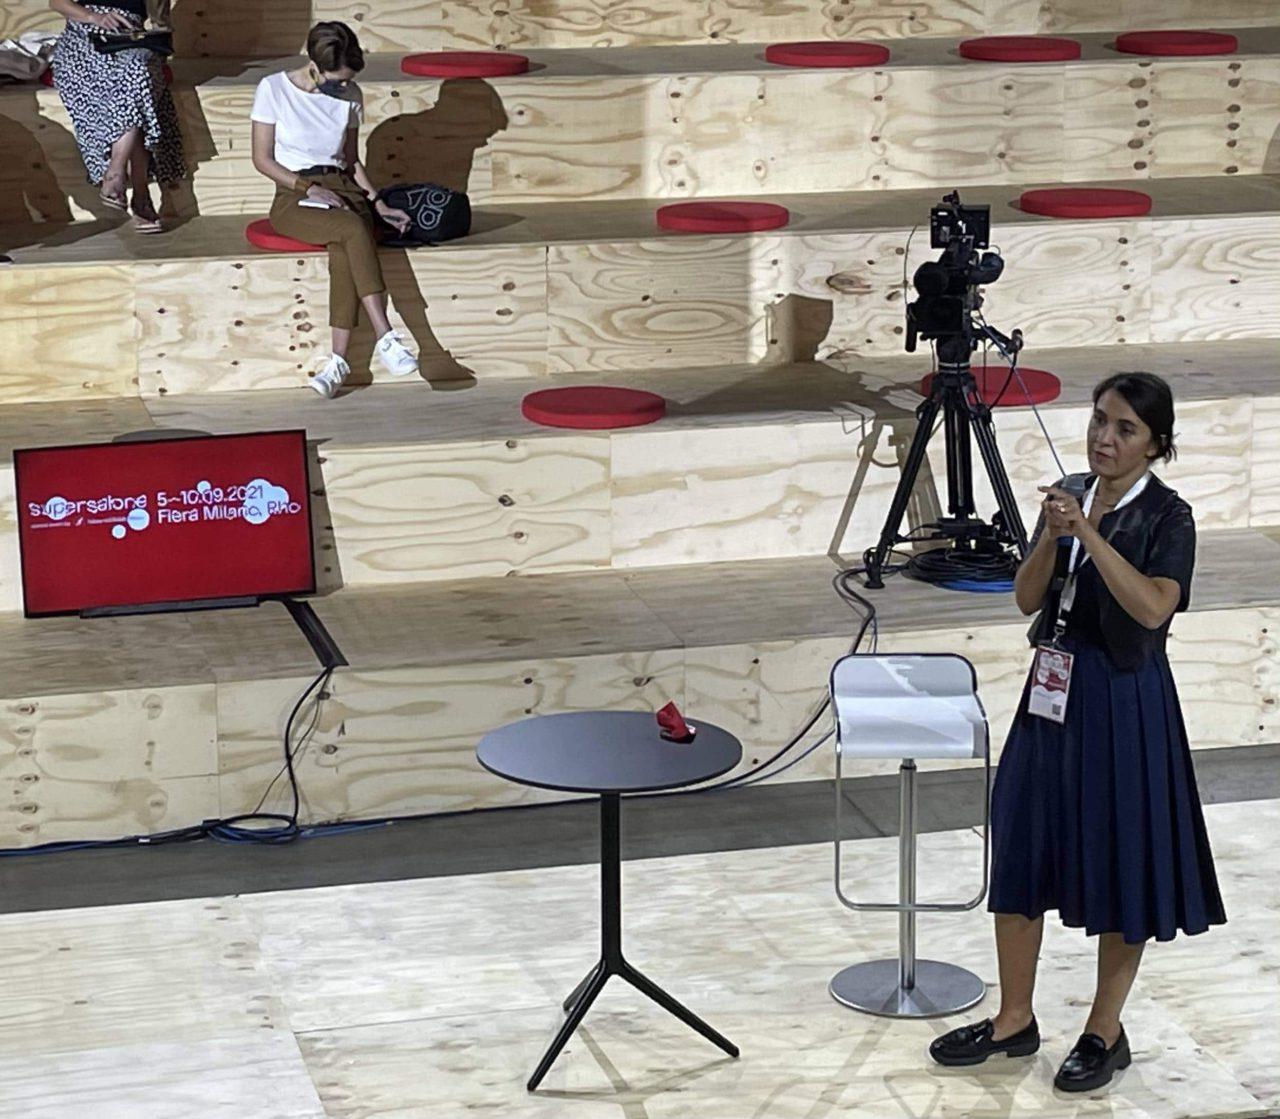 maria porro konferencja prasowa salone del mobile 2021